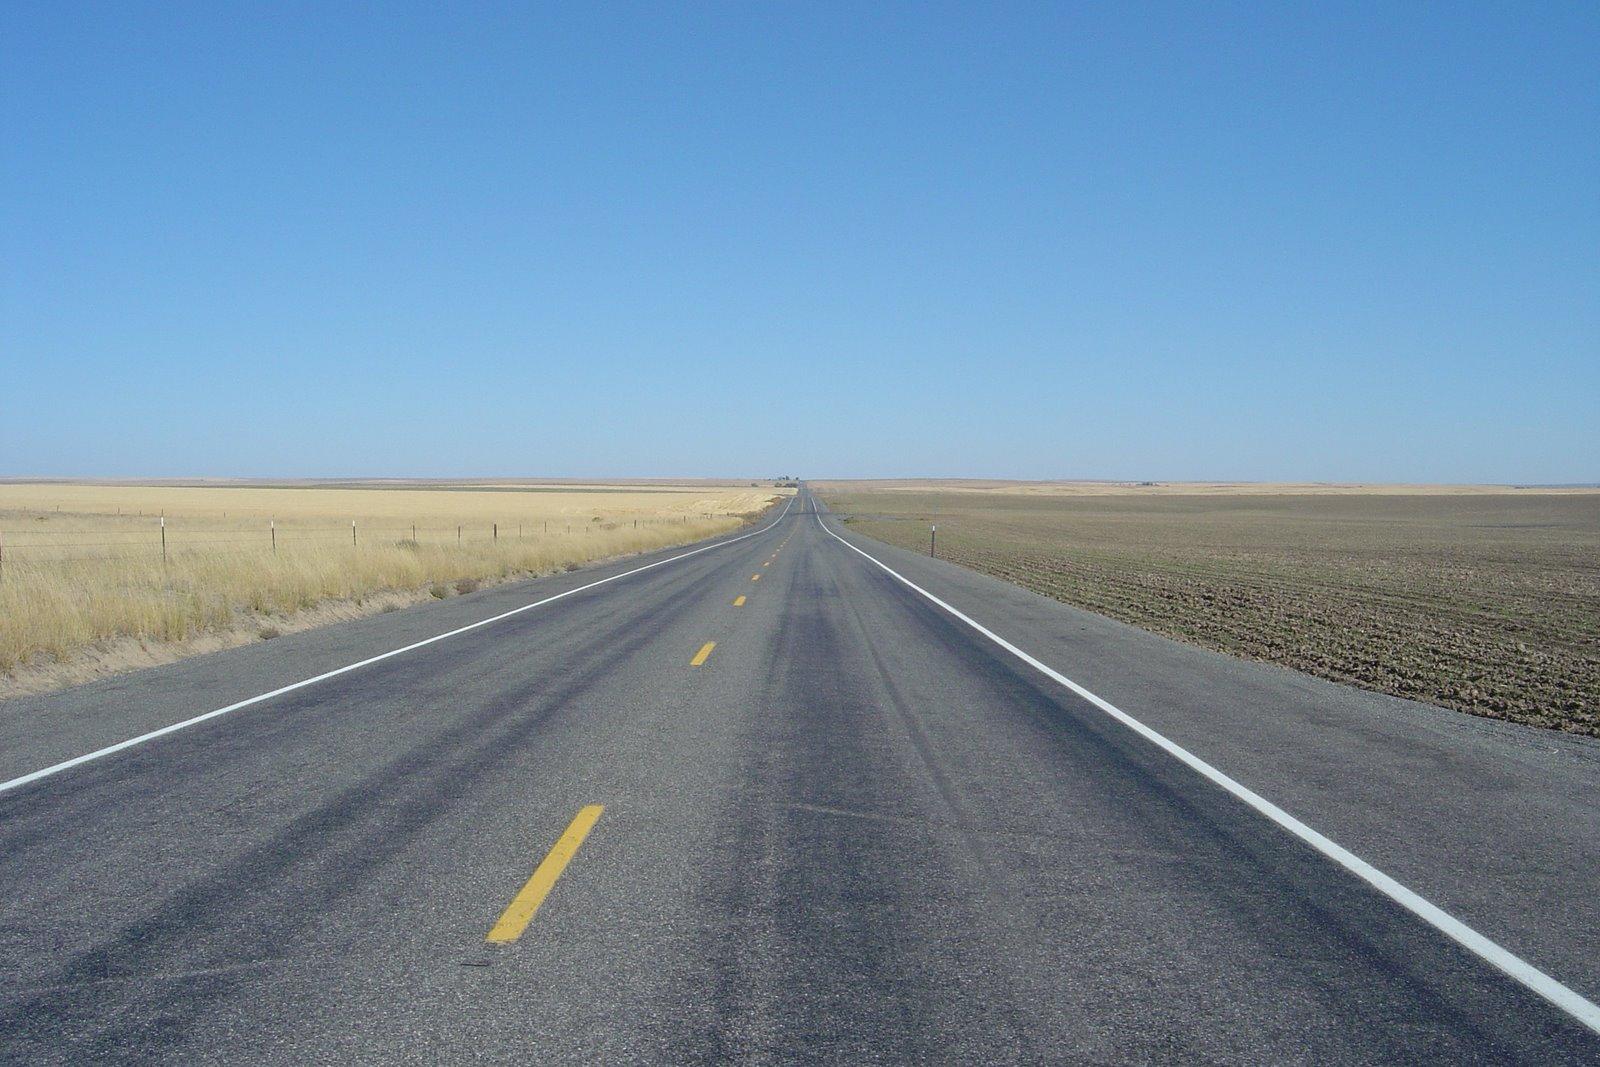 endless road - photo #25